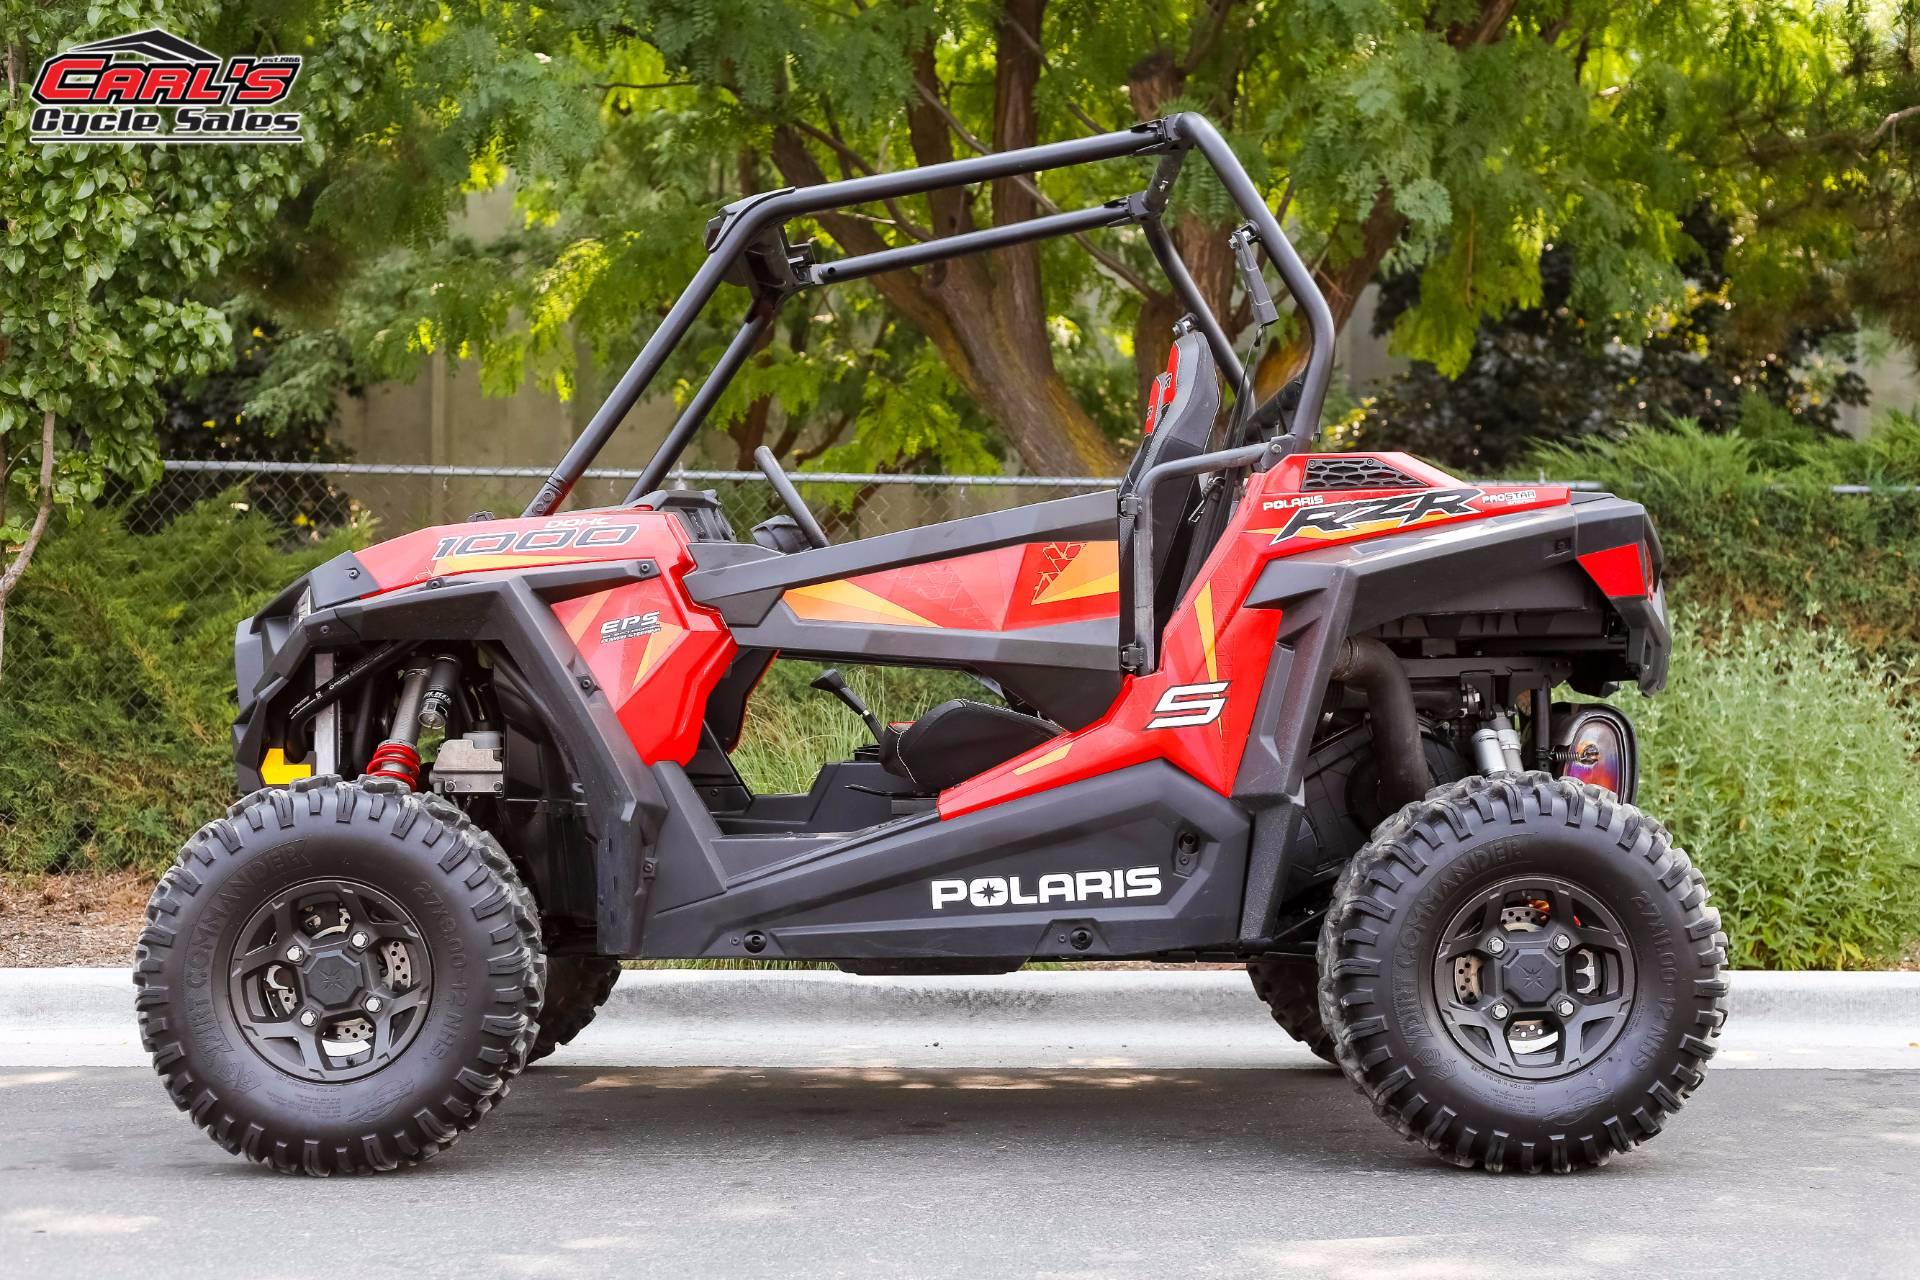 2017 Polaris RZR S 1000 EPS for sale 55713